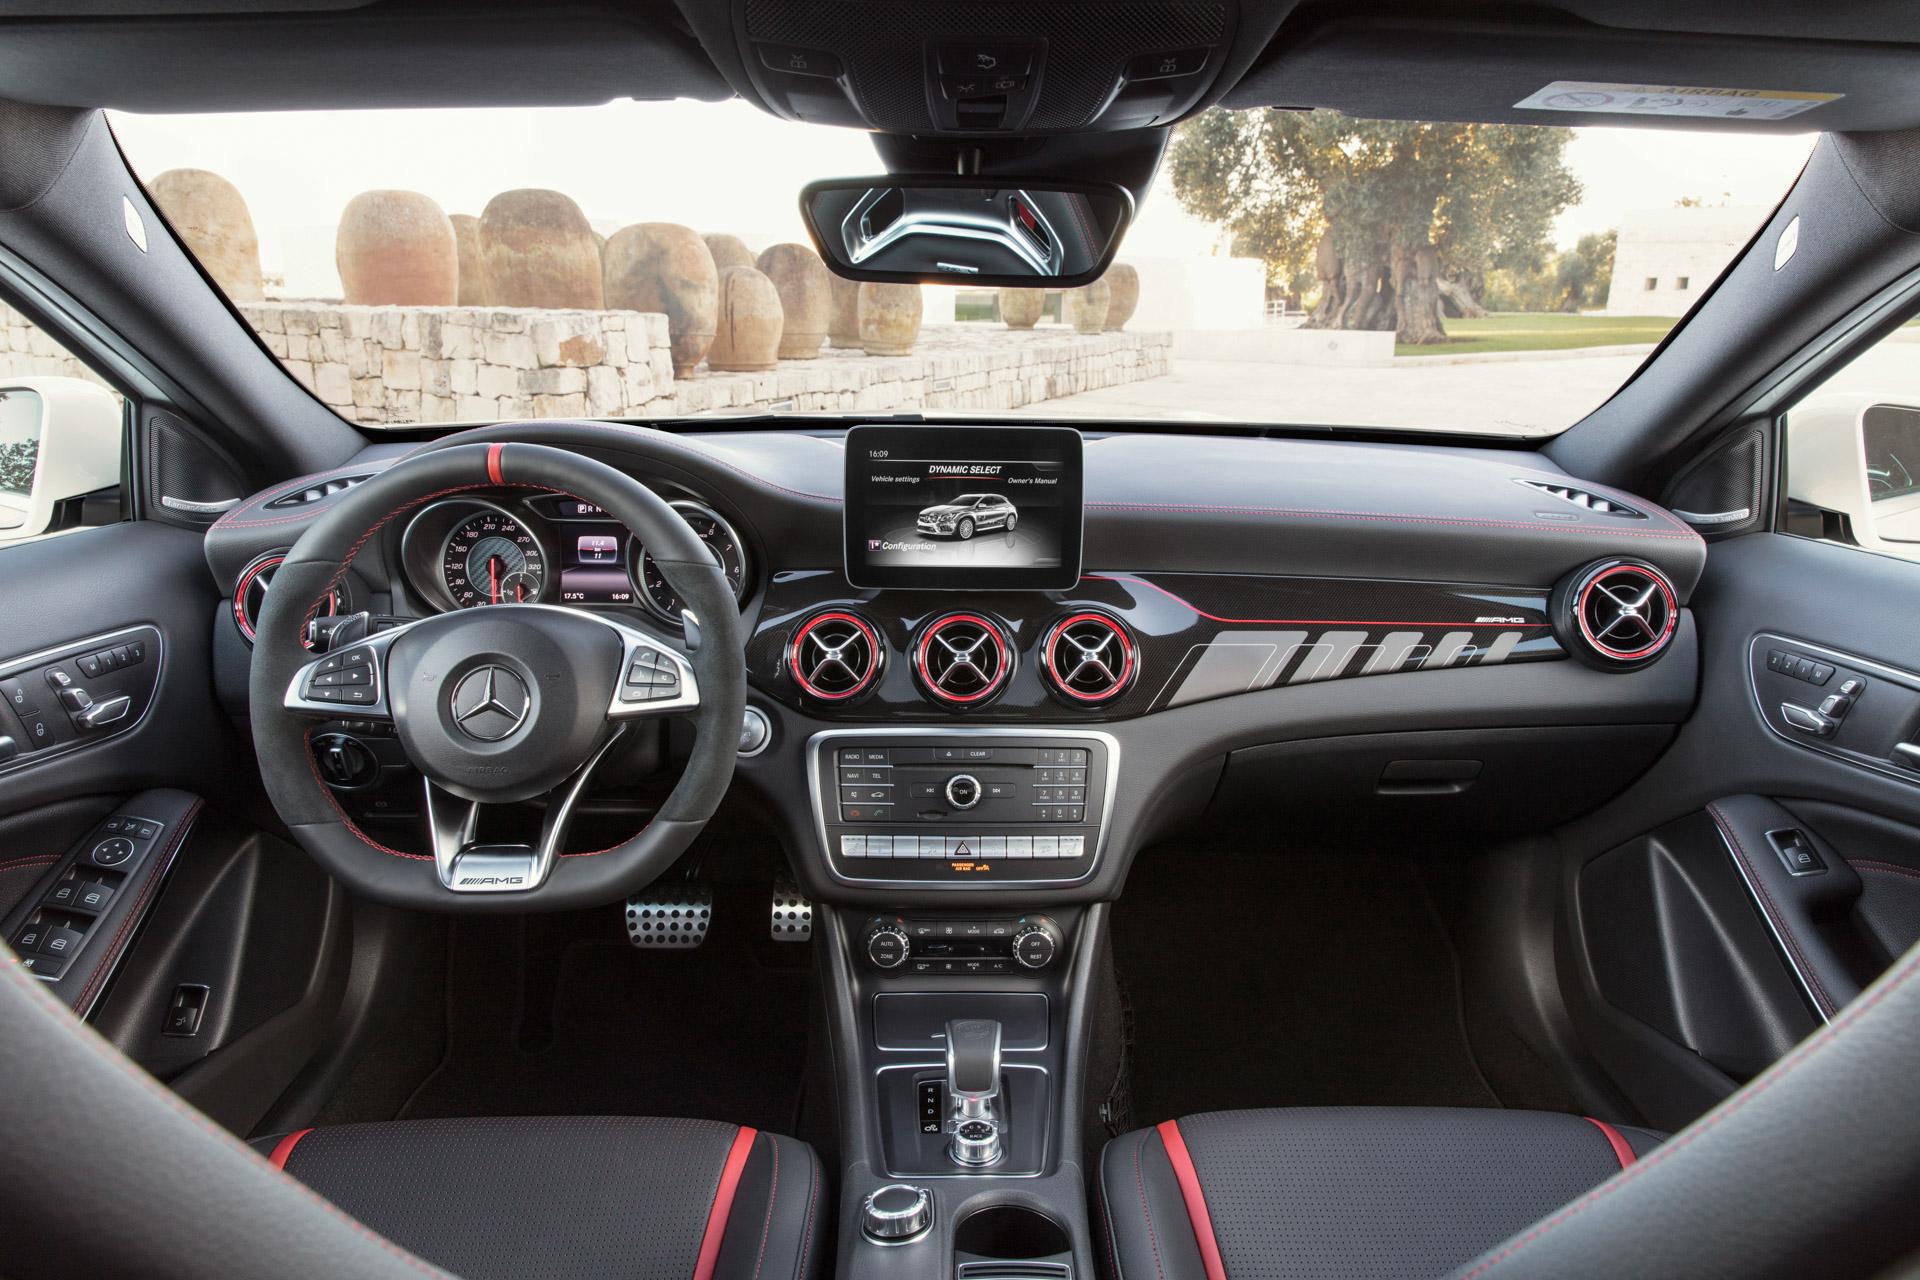 Mercedes-AMG GLA 45 4MATIC, Interieur, DINAMICA schwarz ;Kraftstoffverbrauch kombiniert:  7,4 l/100 km, CO2-Emissionen kombiniert: 172 g/km Mercedes-AMG GLA 45 4MATIC, Interieur, DINAMICA schwarz; Fuel consumption combined:  7,4 l/100 km; Combined CO2 emissions: 172 g/km